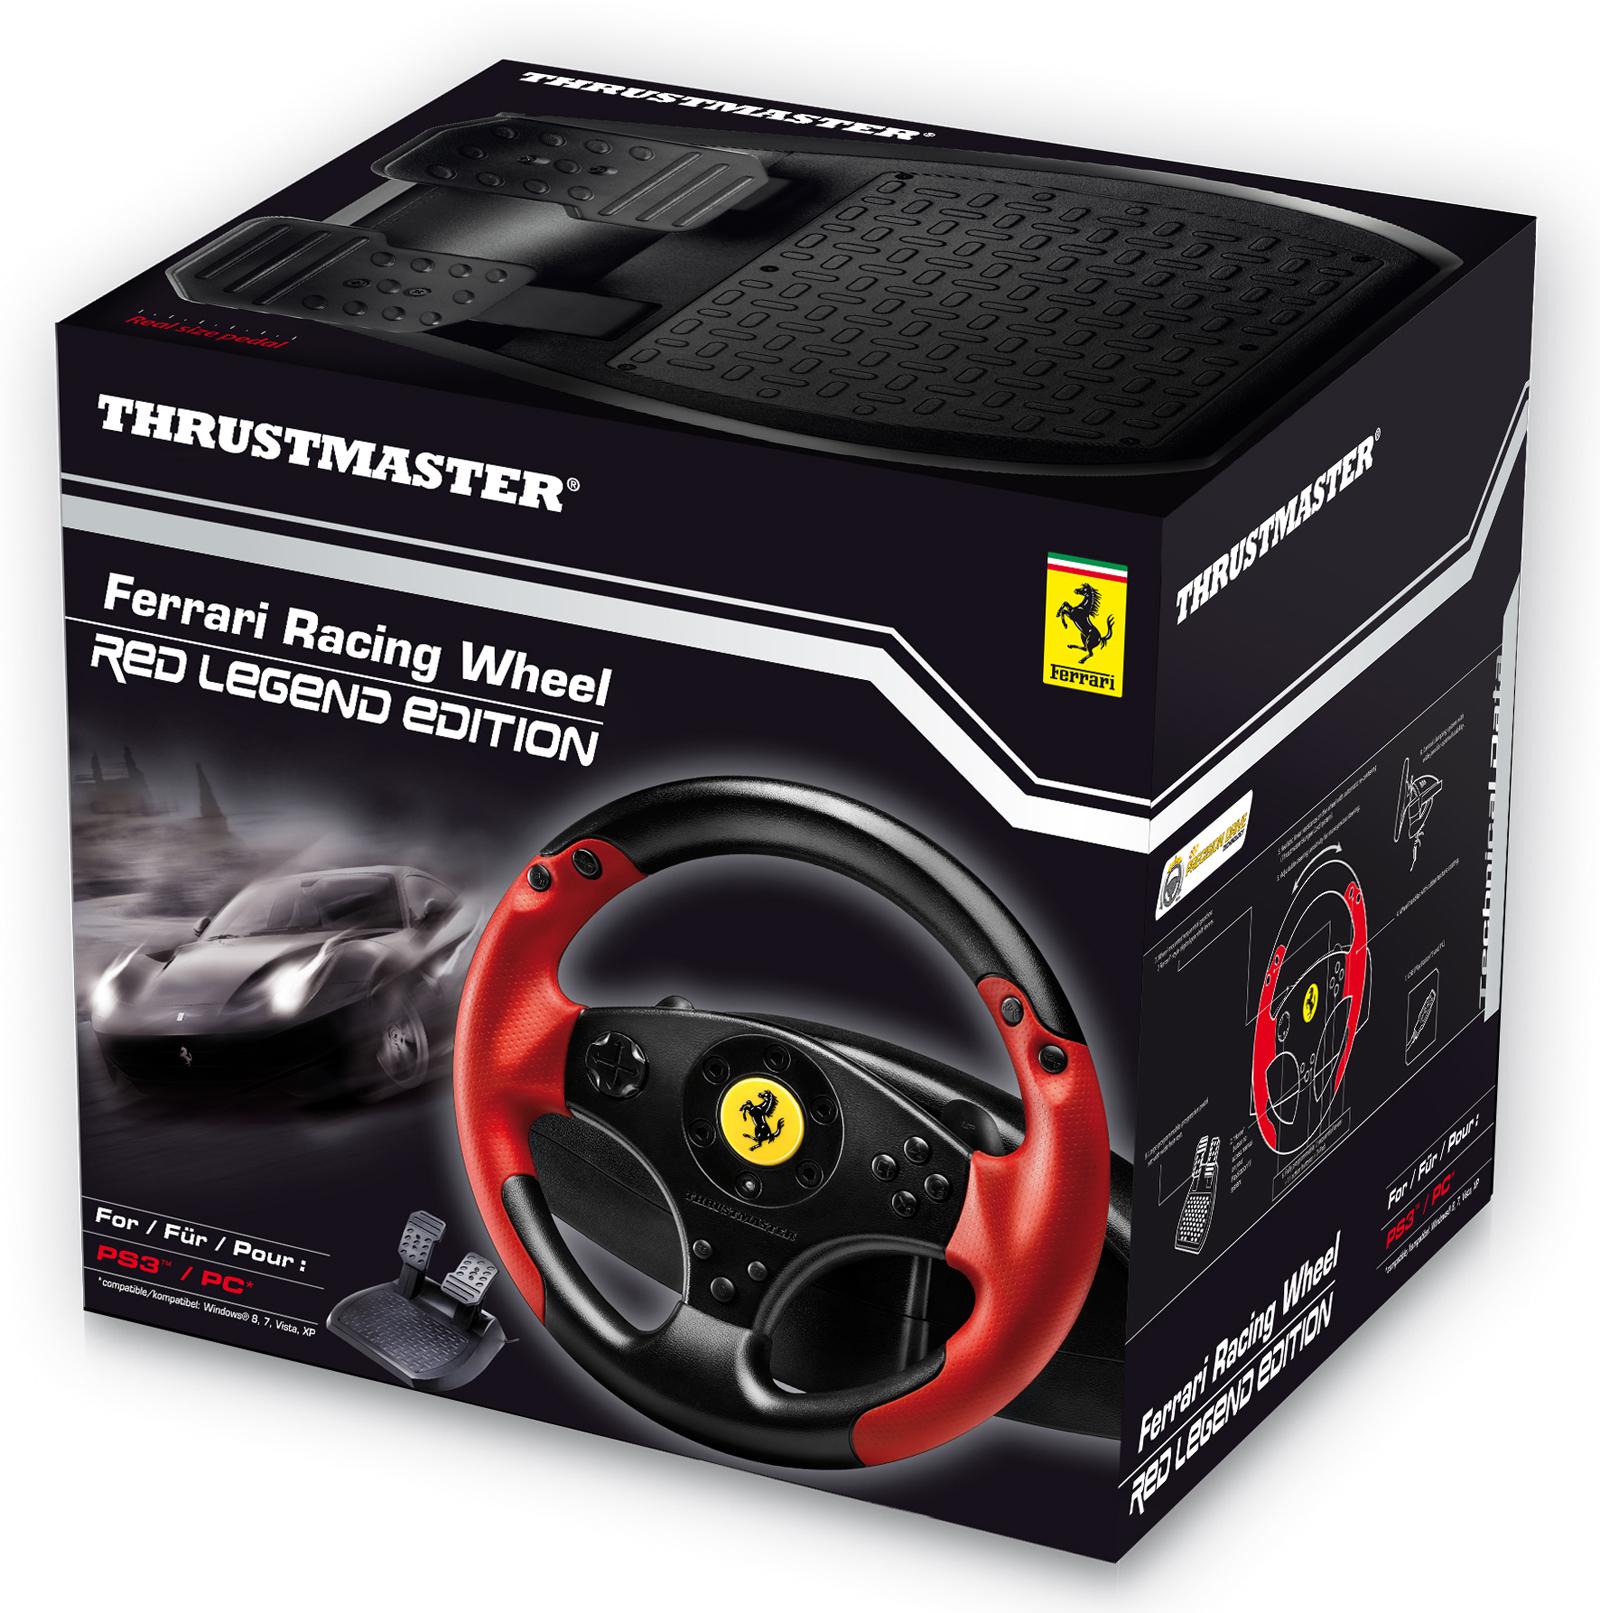 Volant Thrustmaster Ferrari Racing Wheel Red Legend